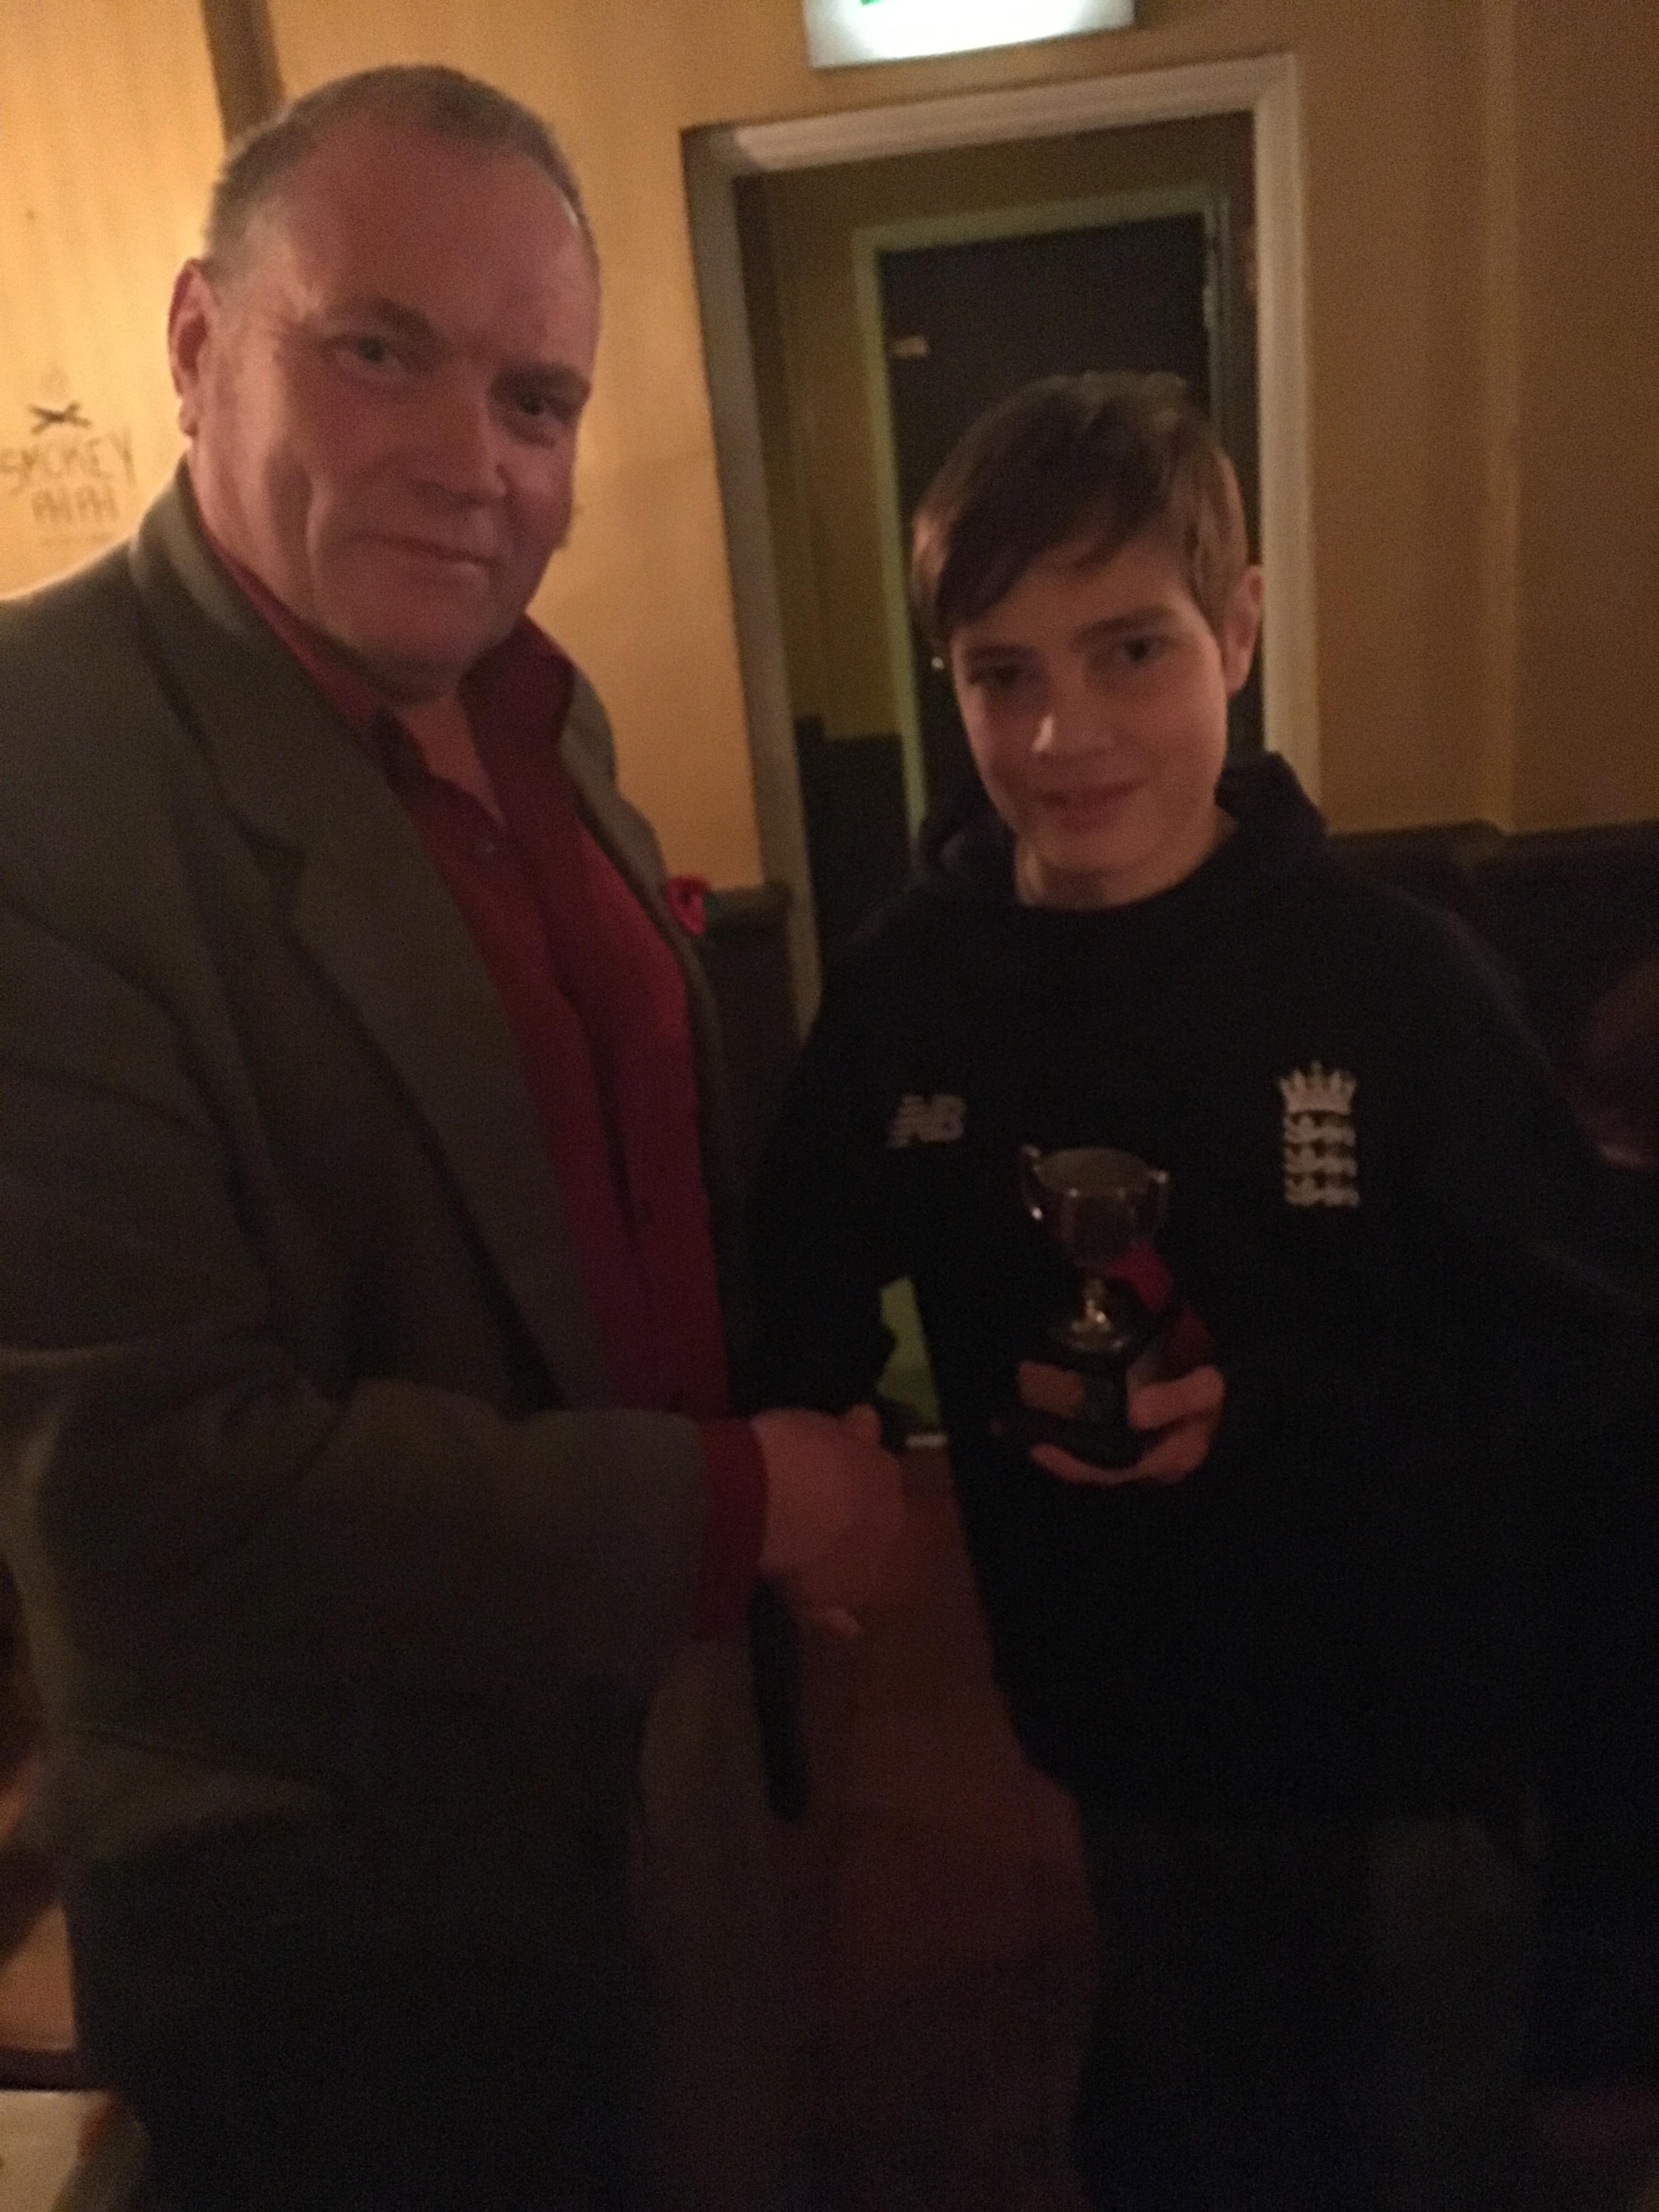 Joel receiving the young player award